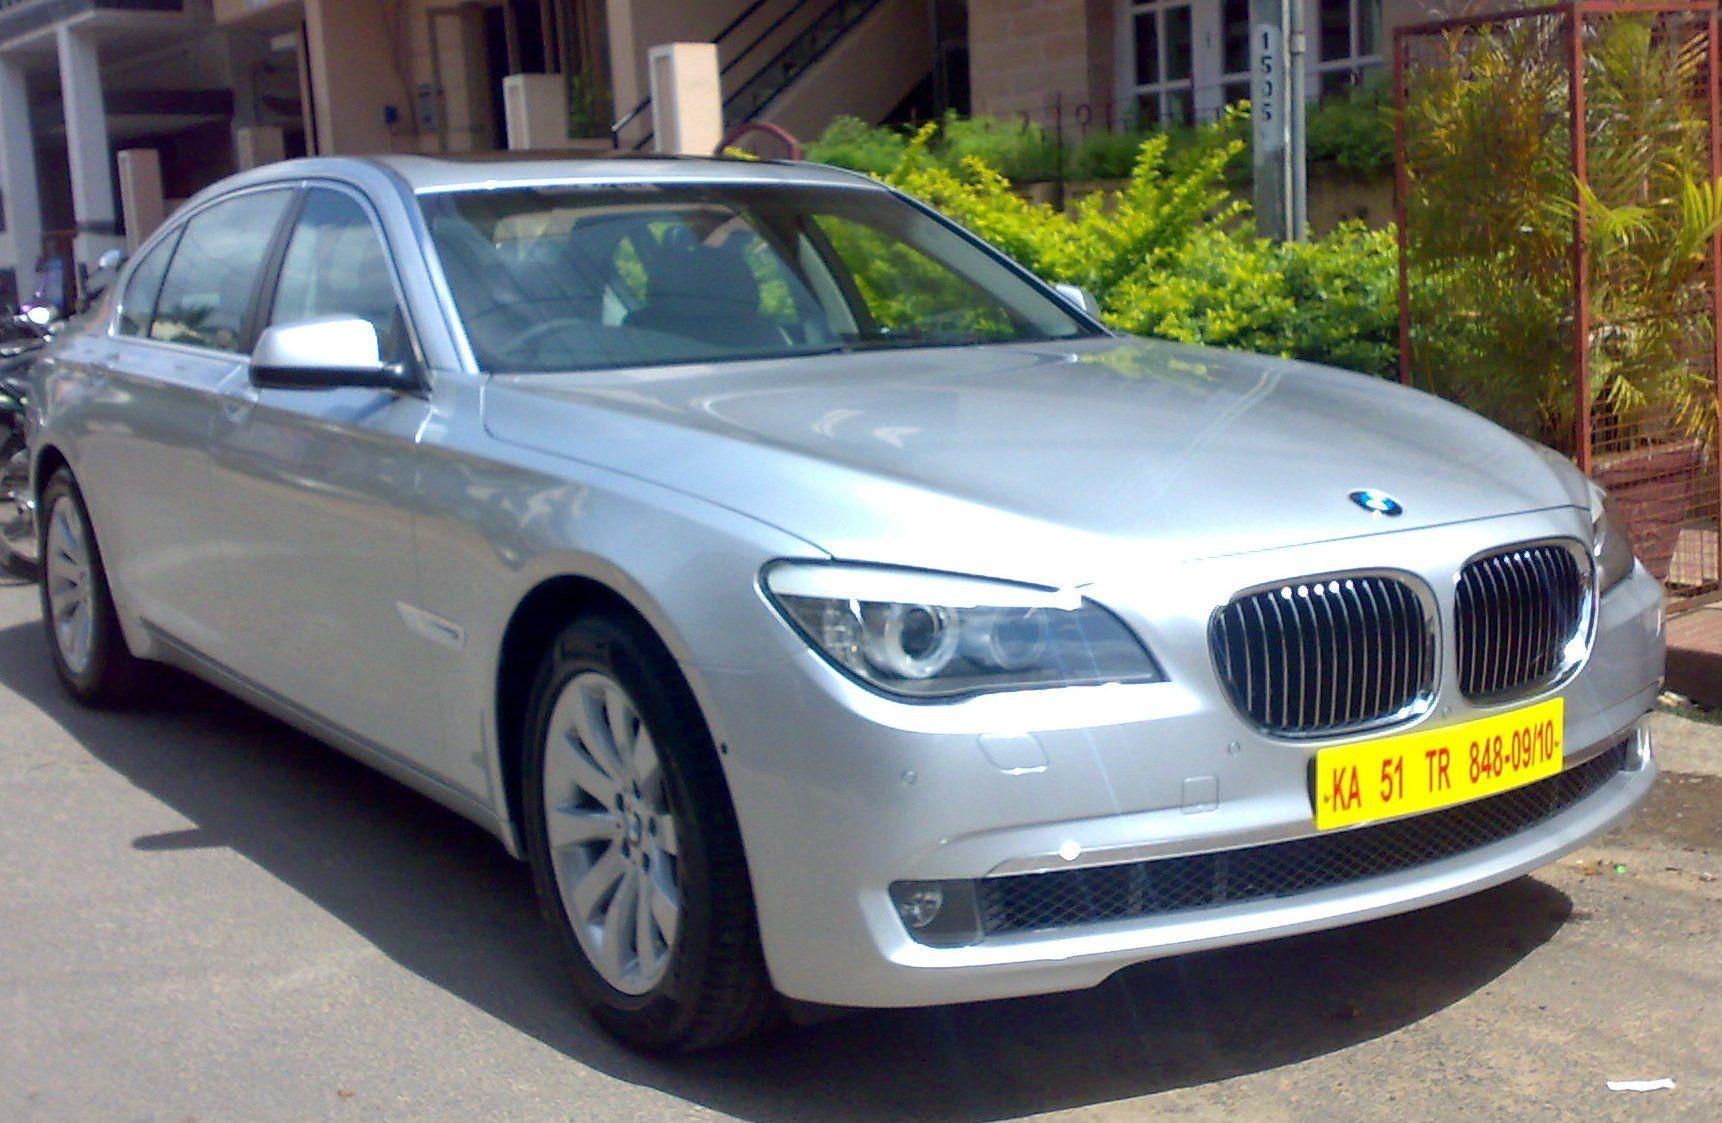 Audi car rentals in bangalore india wedding benz car rentals in bangalore india http